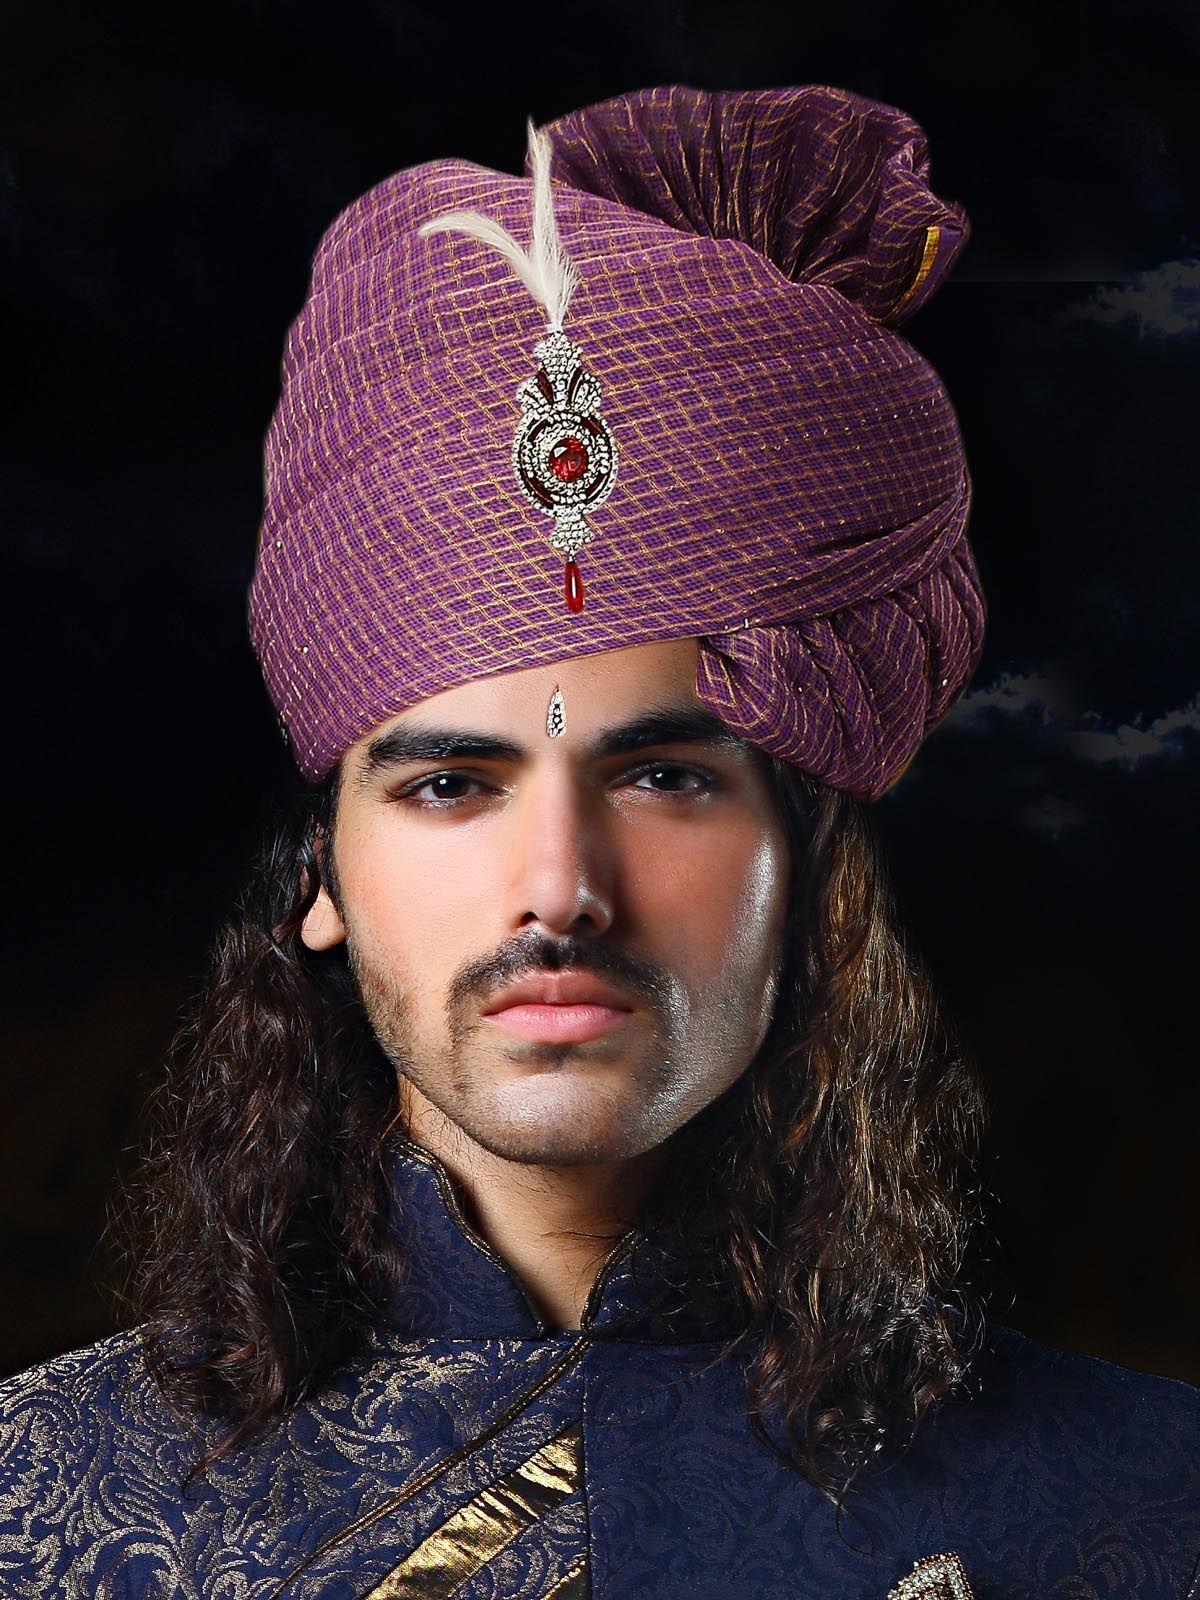 Turban reception turban wedding turban groom turban jodhpuri